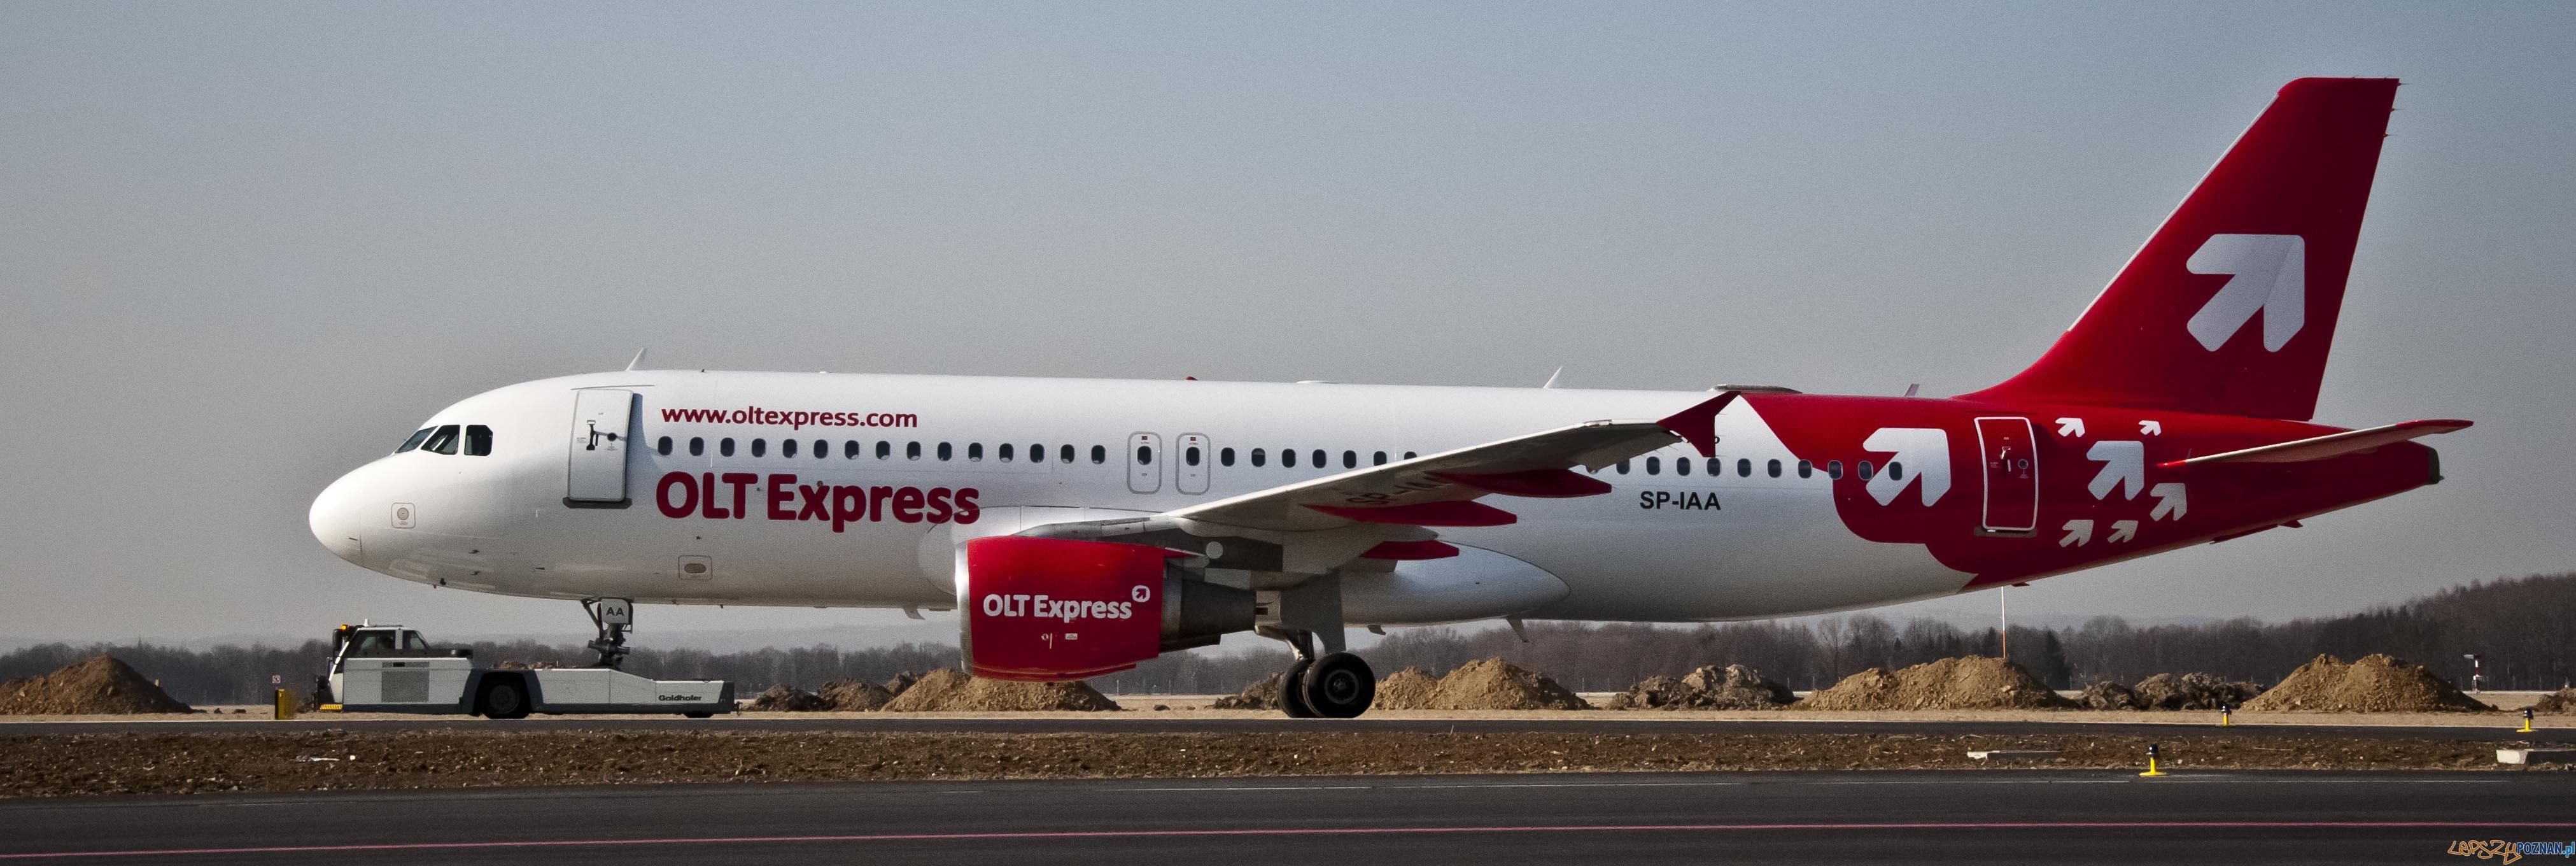 OLT_Express_Airbus_5  Foto: JACEK LYCZBA